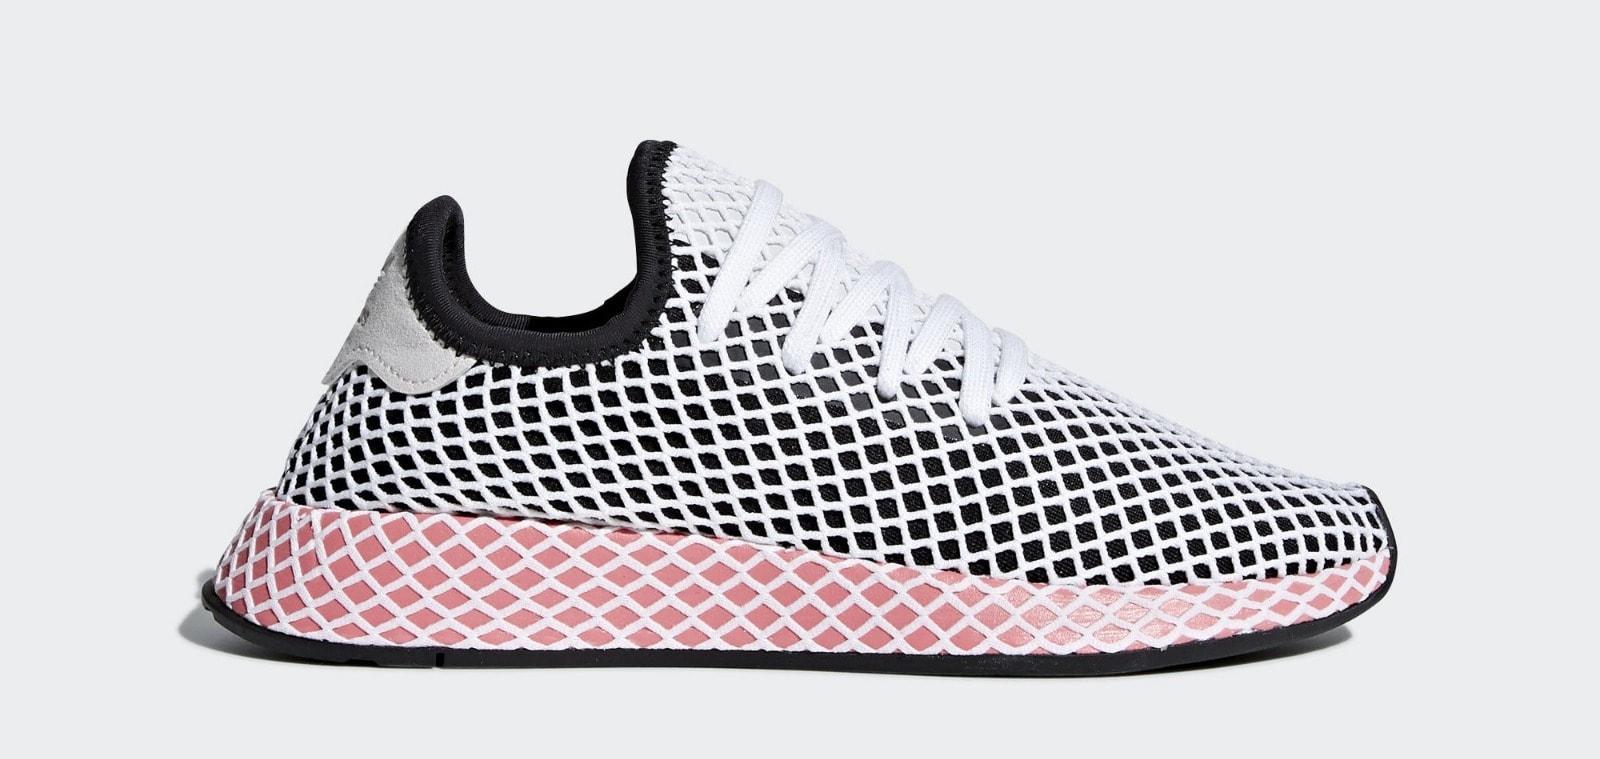 4b01600190166c adidas Deerupt Runner